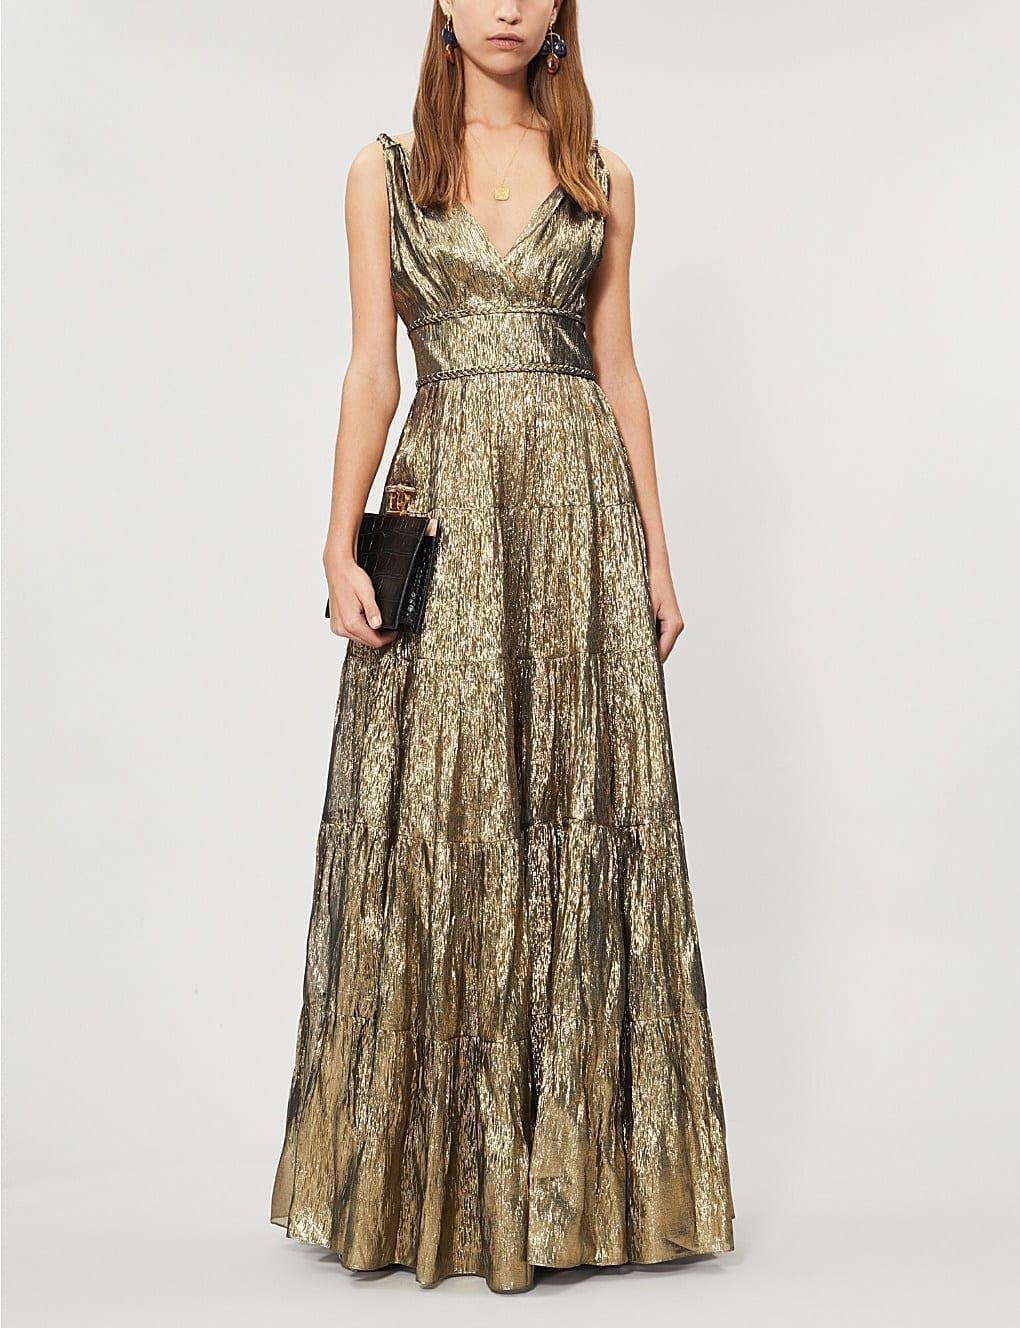 dae9a0e4 OSCAR DE LA RENTA Metallic Silk-Blend Gold Gown - We Select Dresses